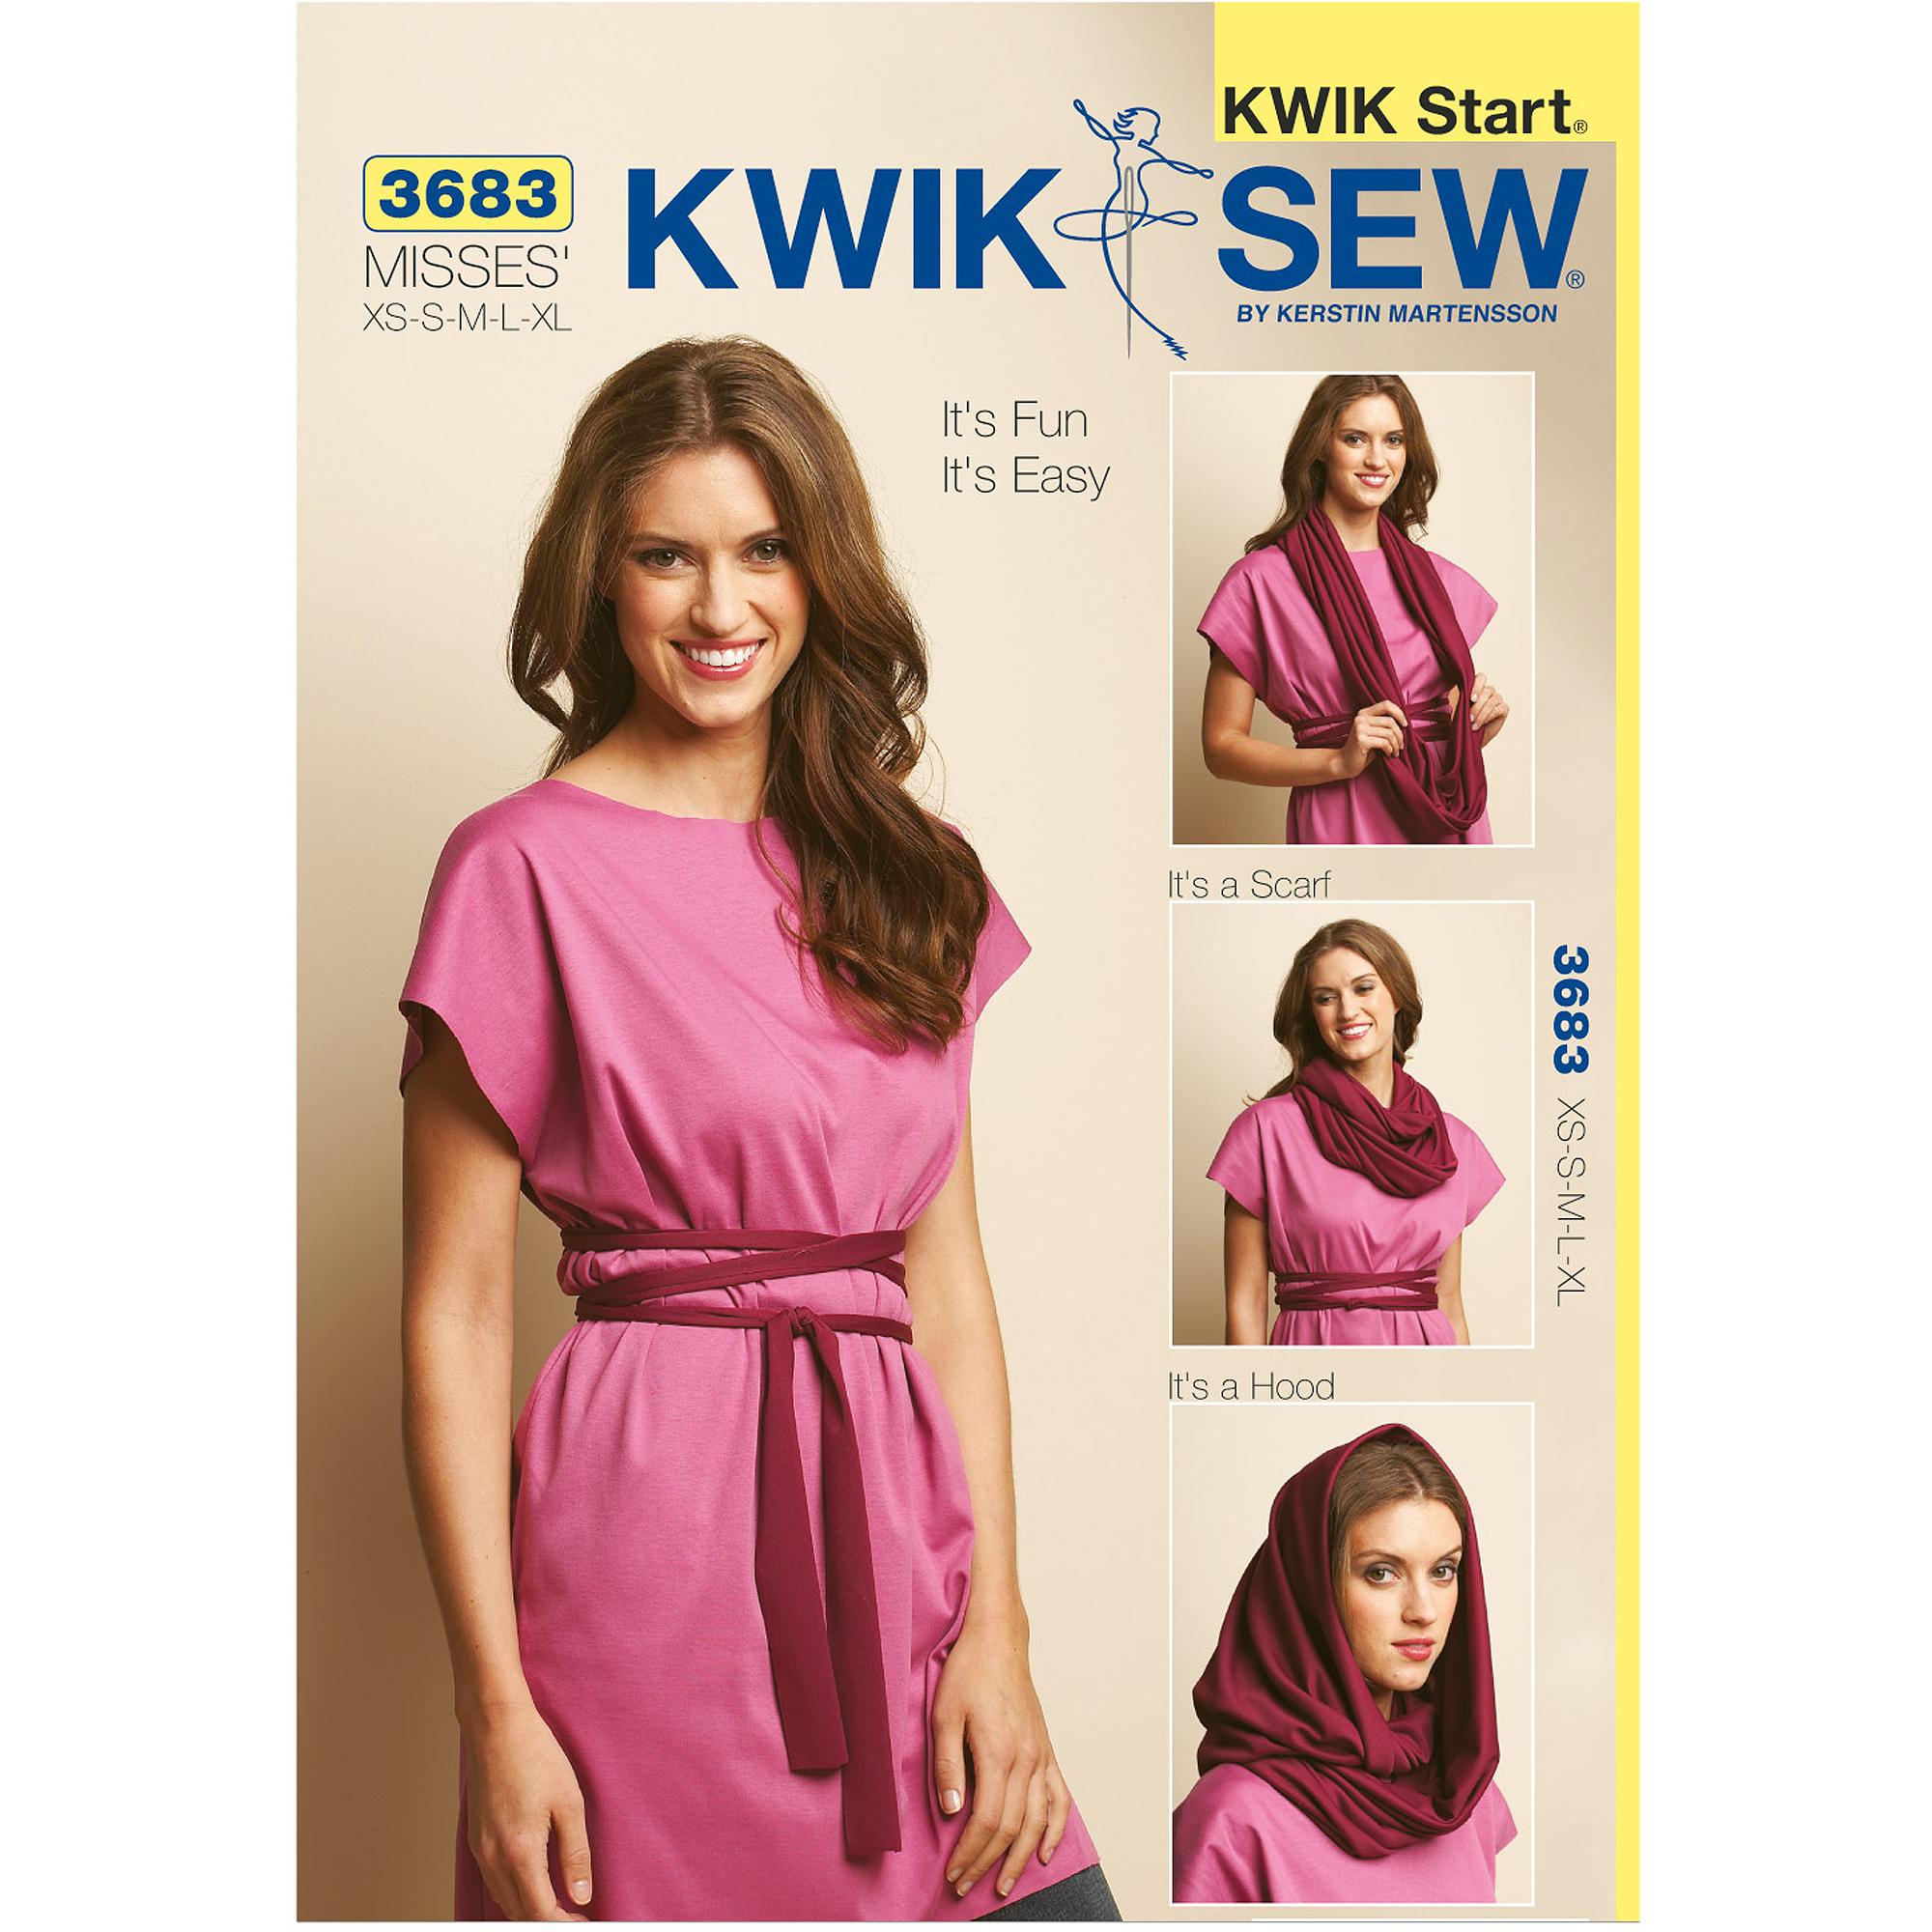 Kwik Sew Pattern Fun and Easy Tunic, Belt and Scarf, (XS, S, M, L, XL)